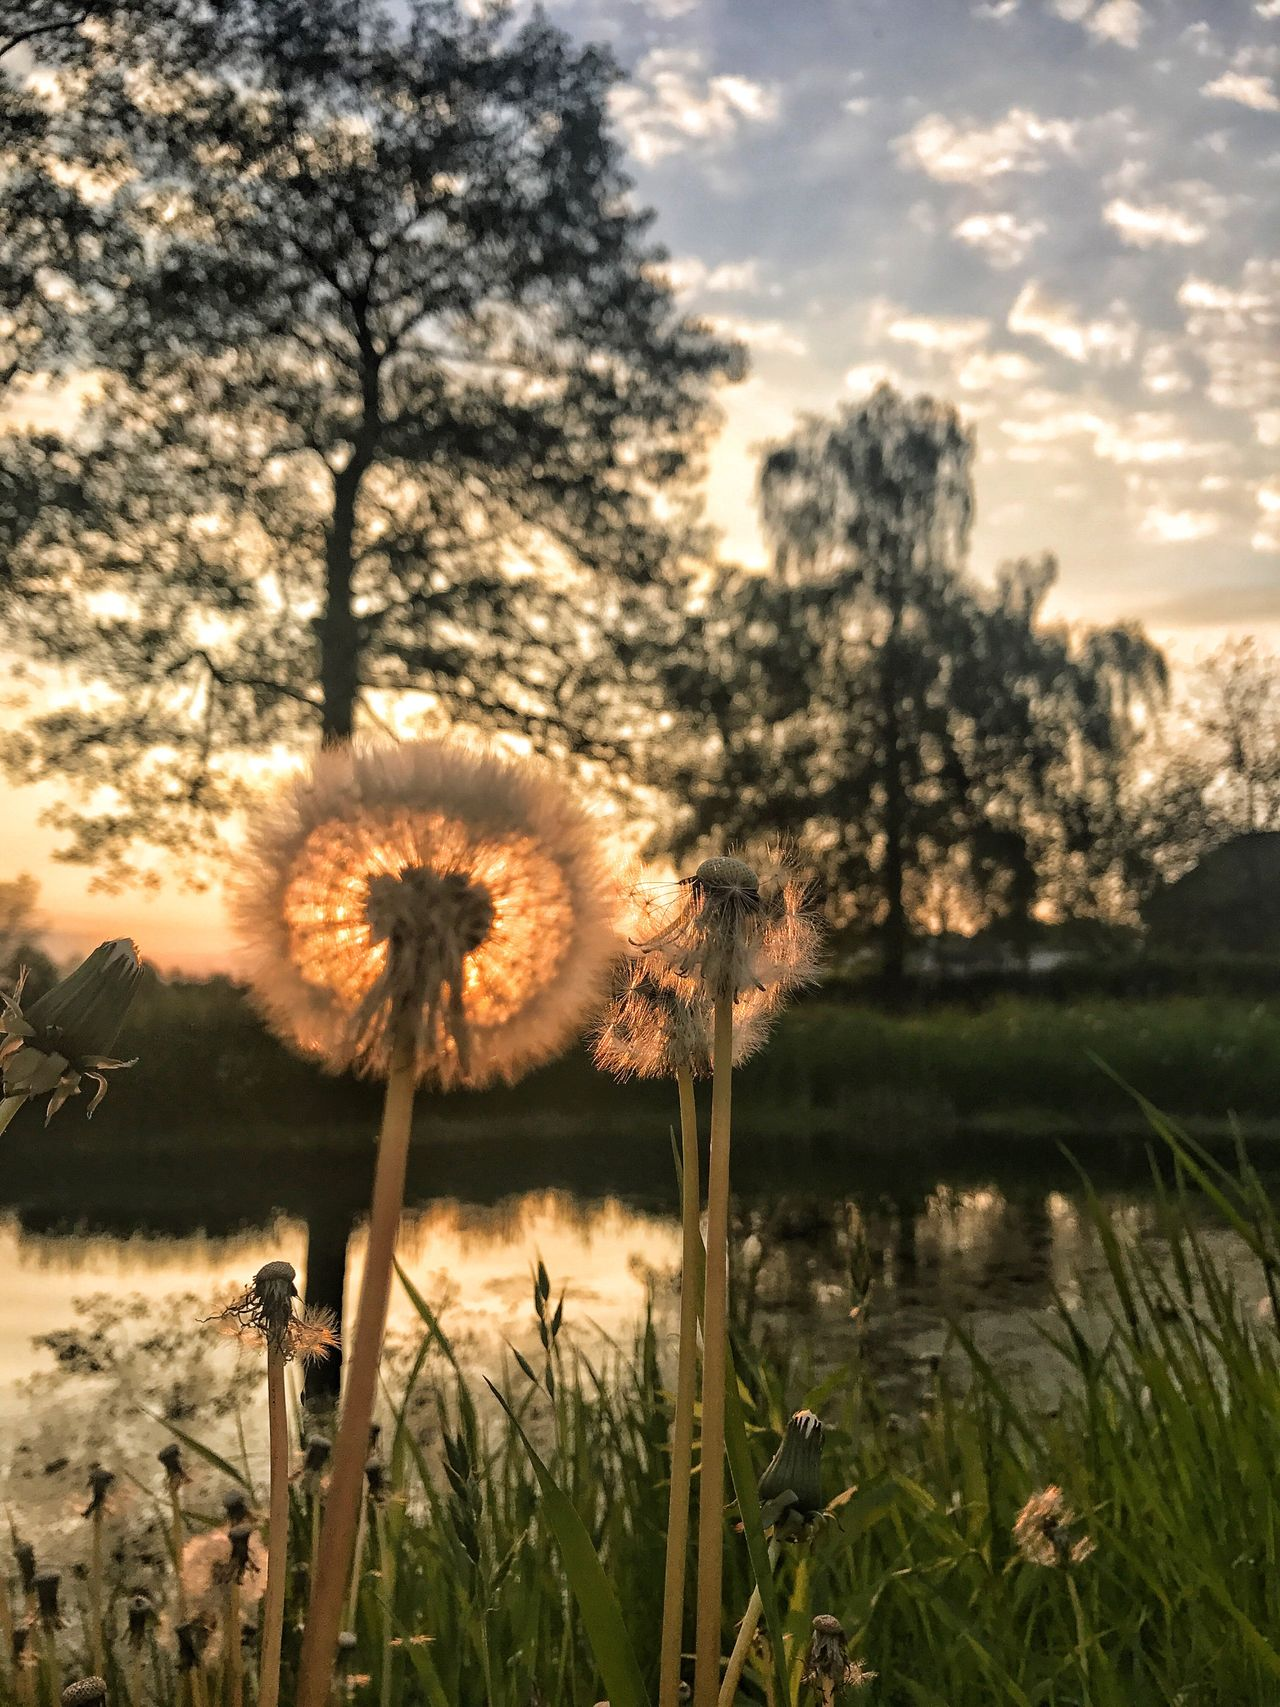 Poland Polska złotno łódź polesie dmuchawiec dentidileon prato łaka field sunset Growth Sky Nature No People Tranquility Fragility Tree Flower Head Plant Beauty In Nature Outdoors Poland 💗